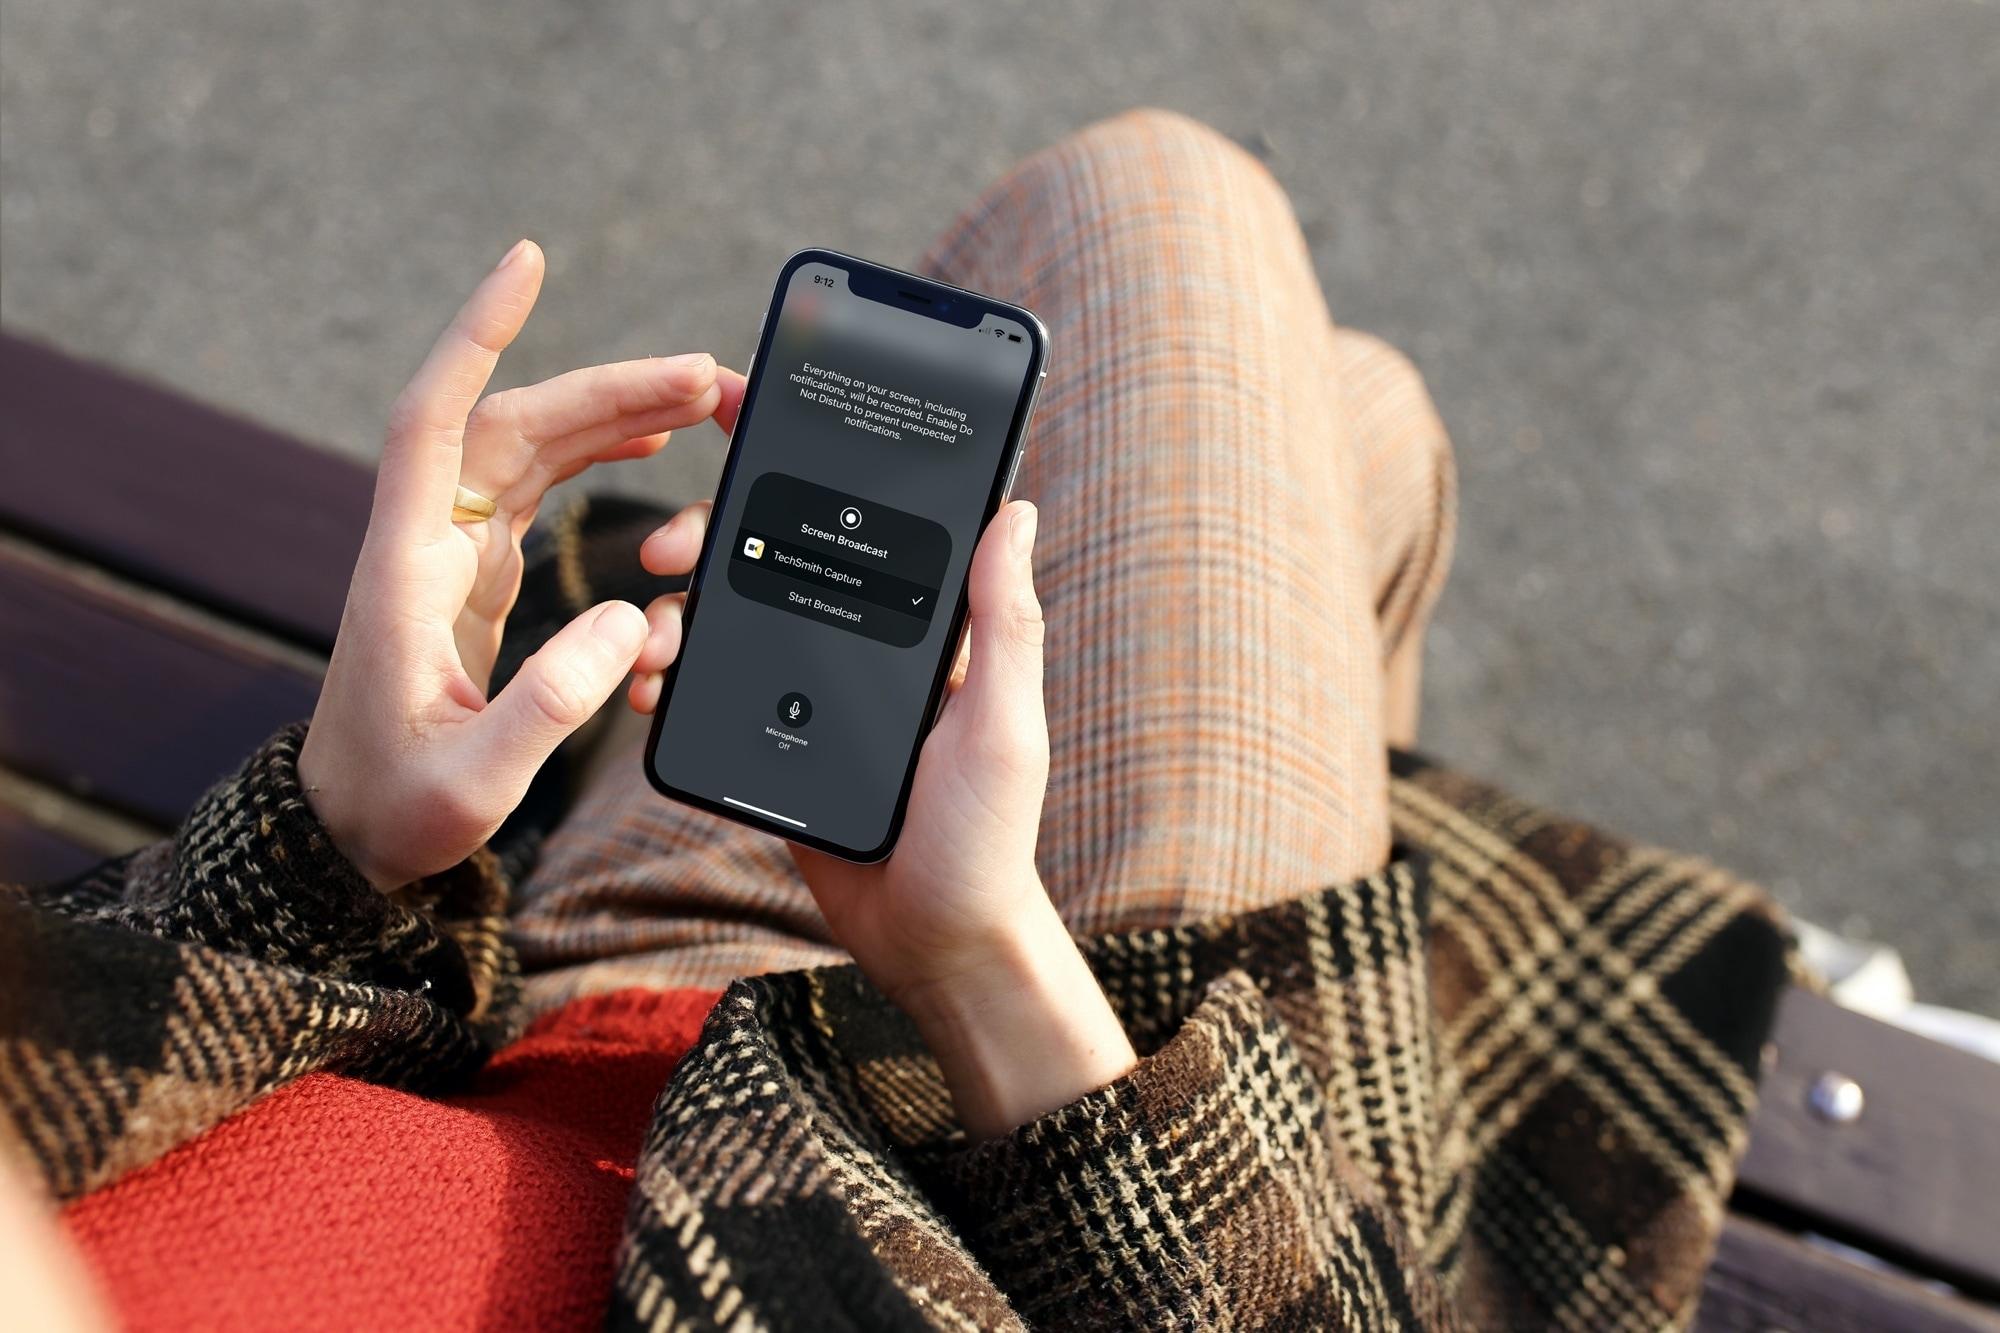 iPhone TechSmith Capture Start Broadcast